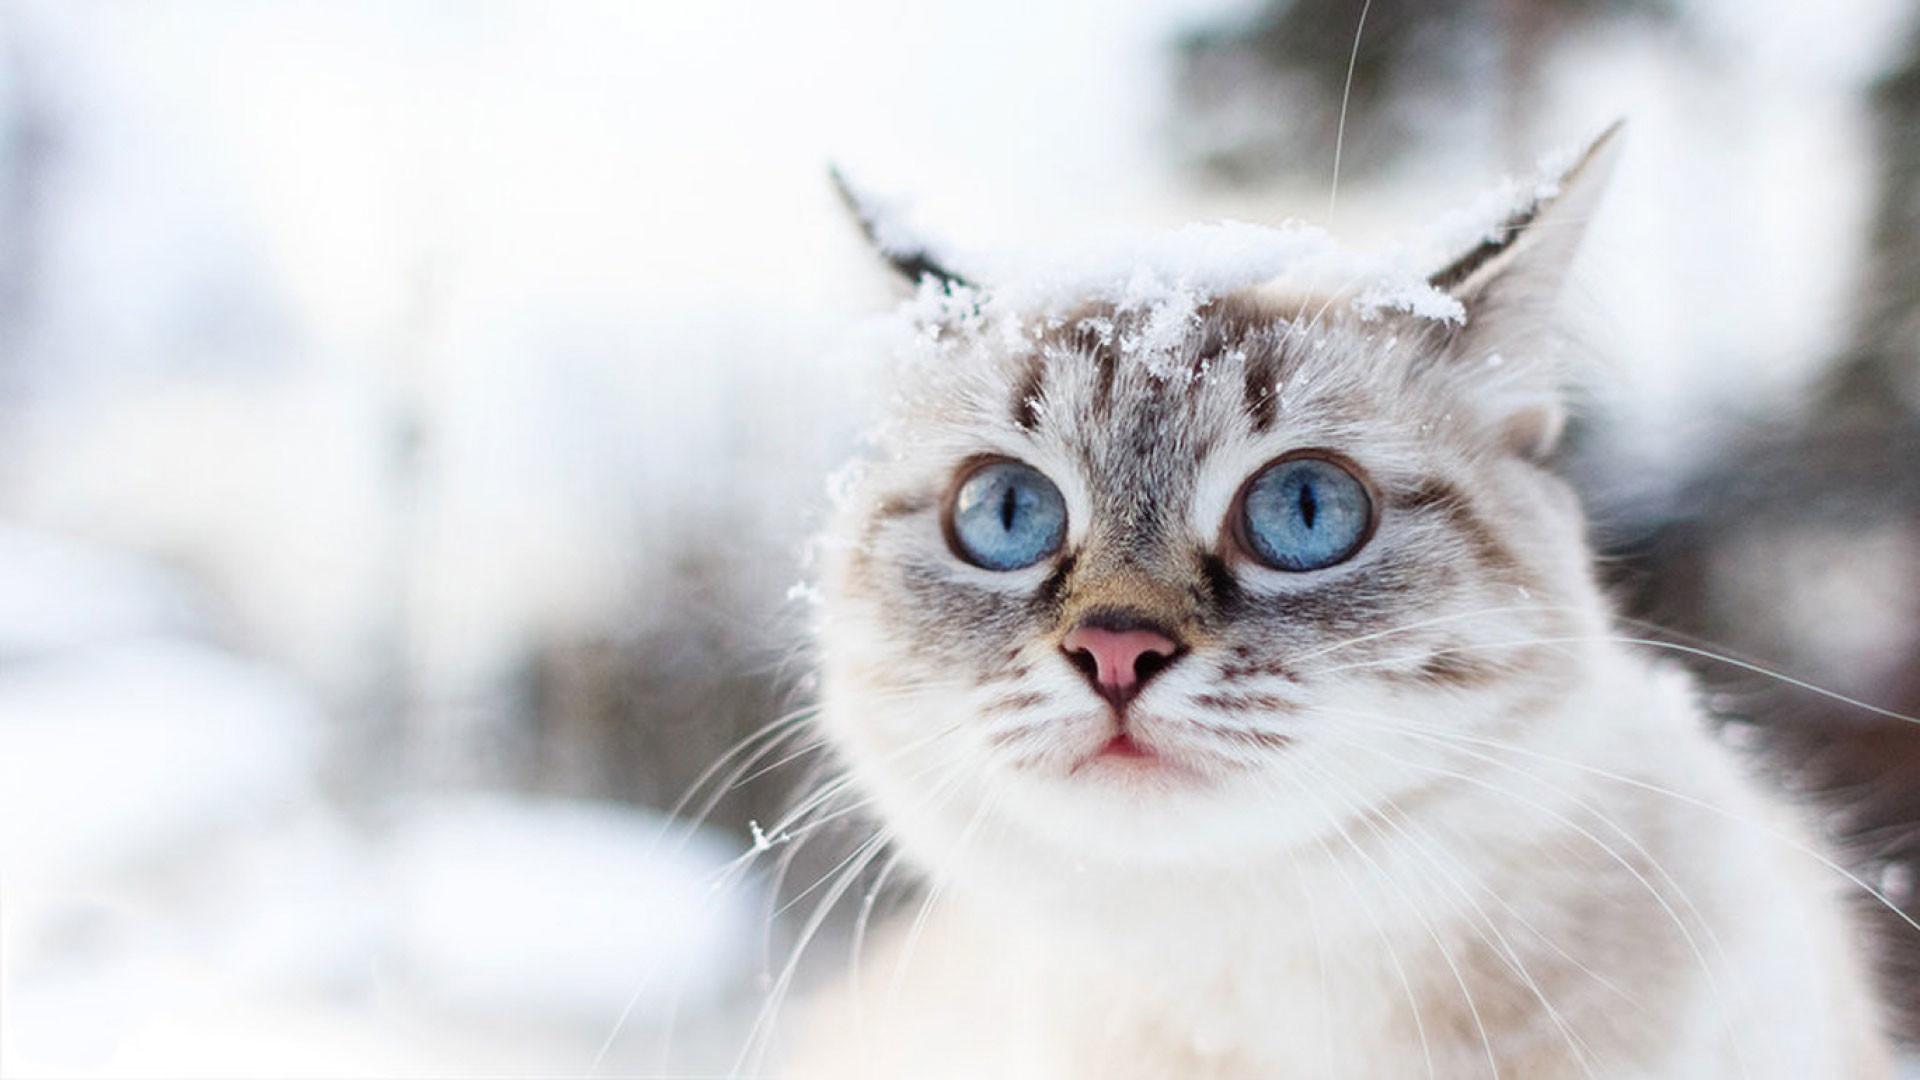 hd pics photos attractive snow cat winter beautiful cute hd quality desktop  background wallpaper